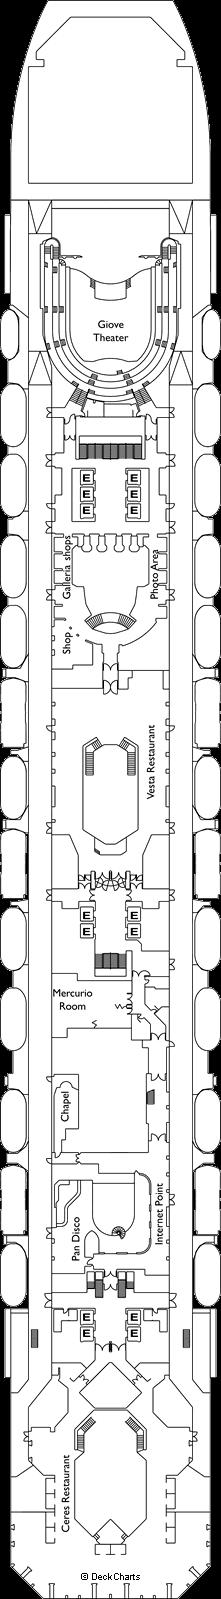 Costa Serena: Orion Deck